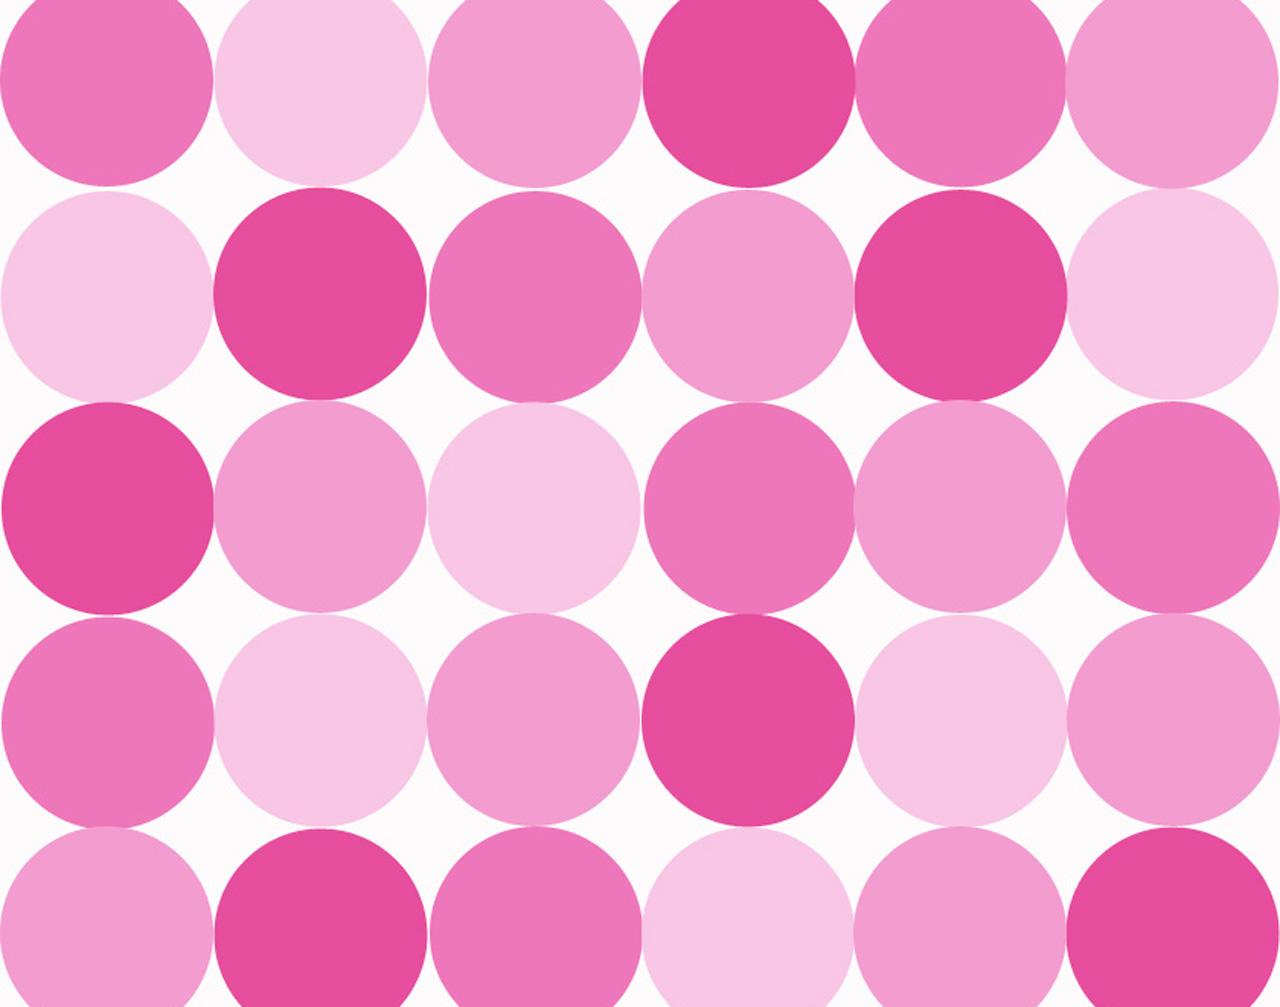 Pink polka dot backgrounds hd wallpaper background